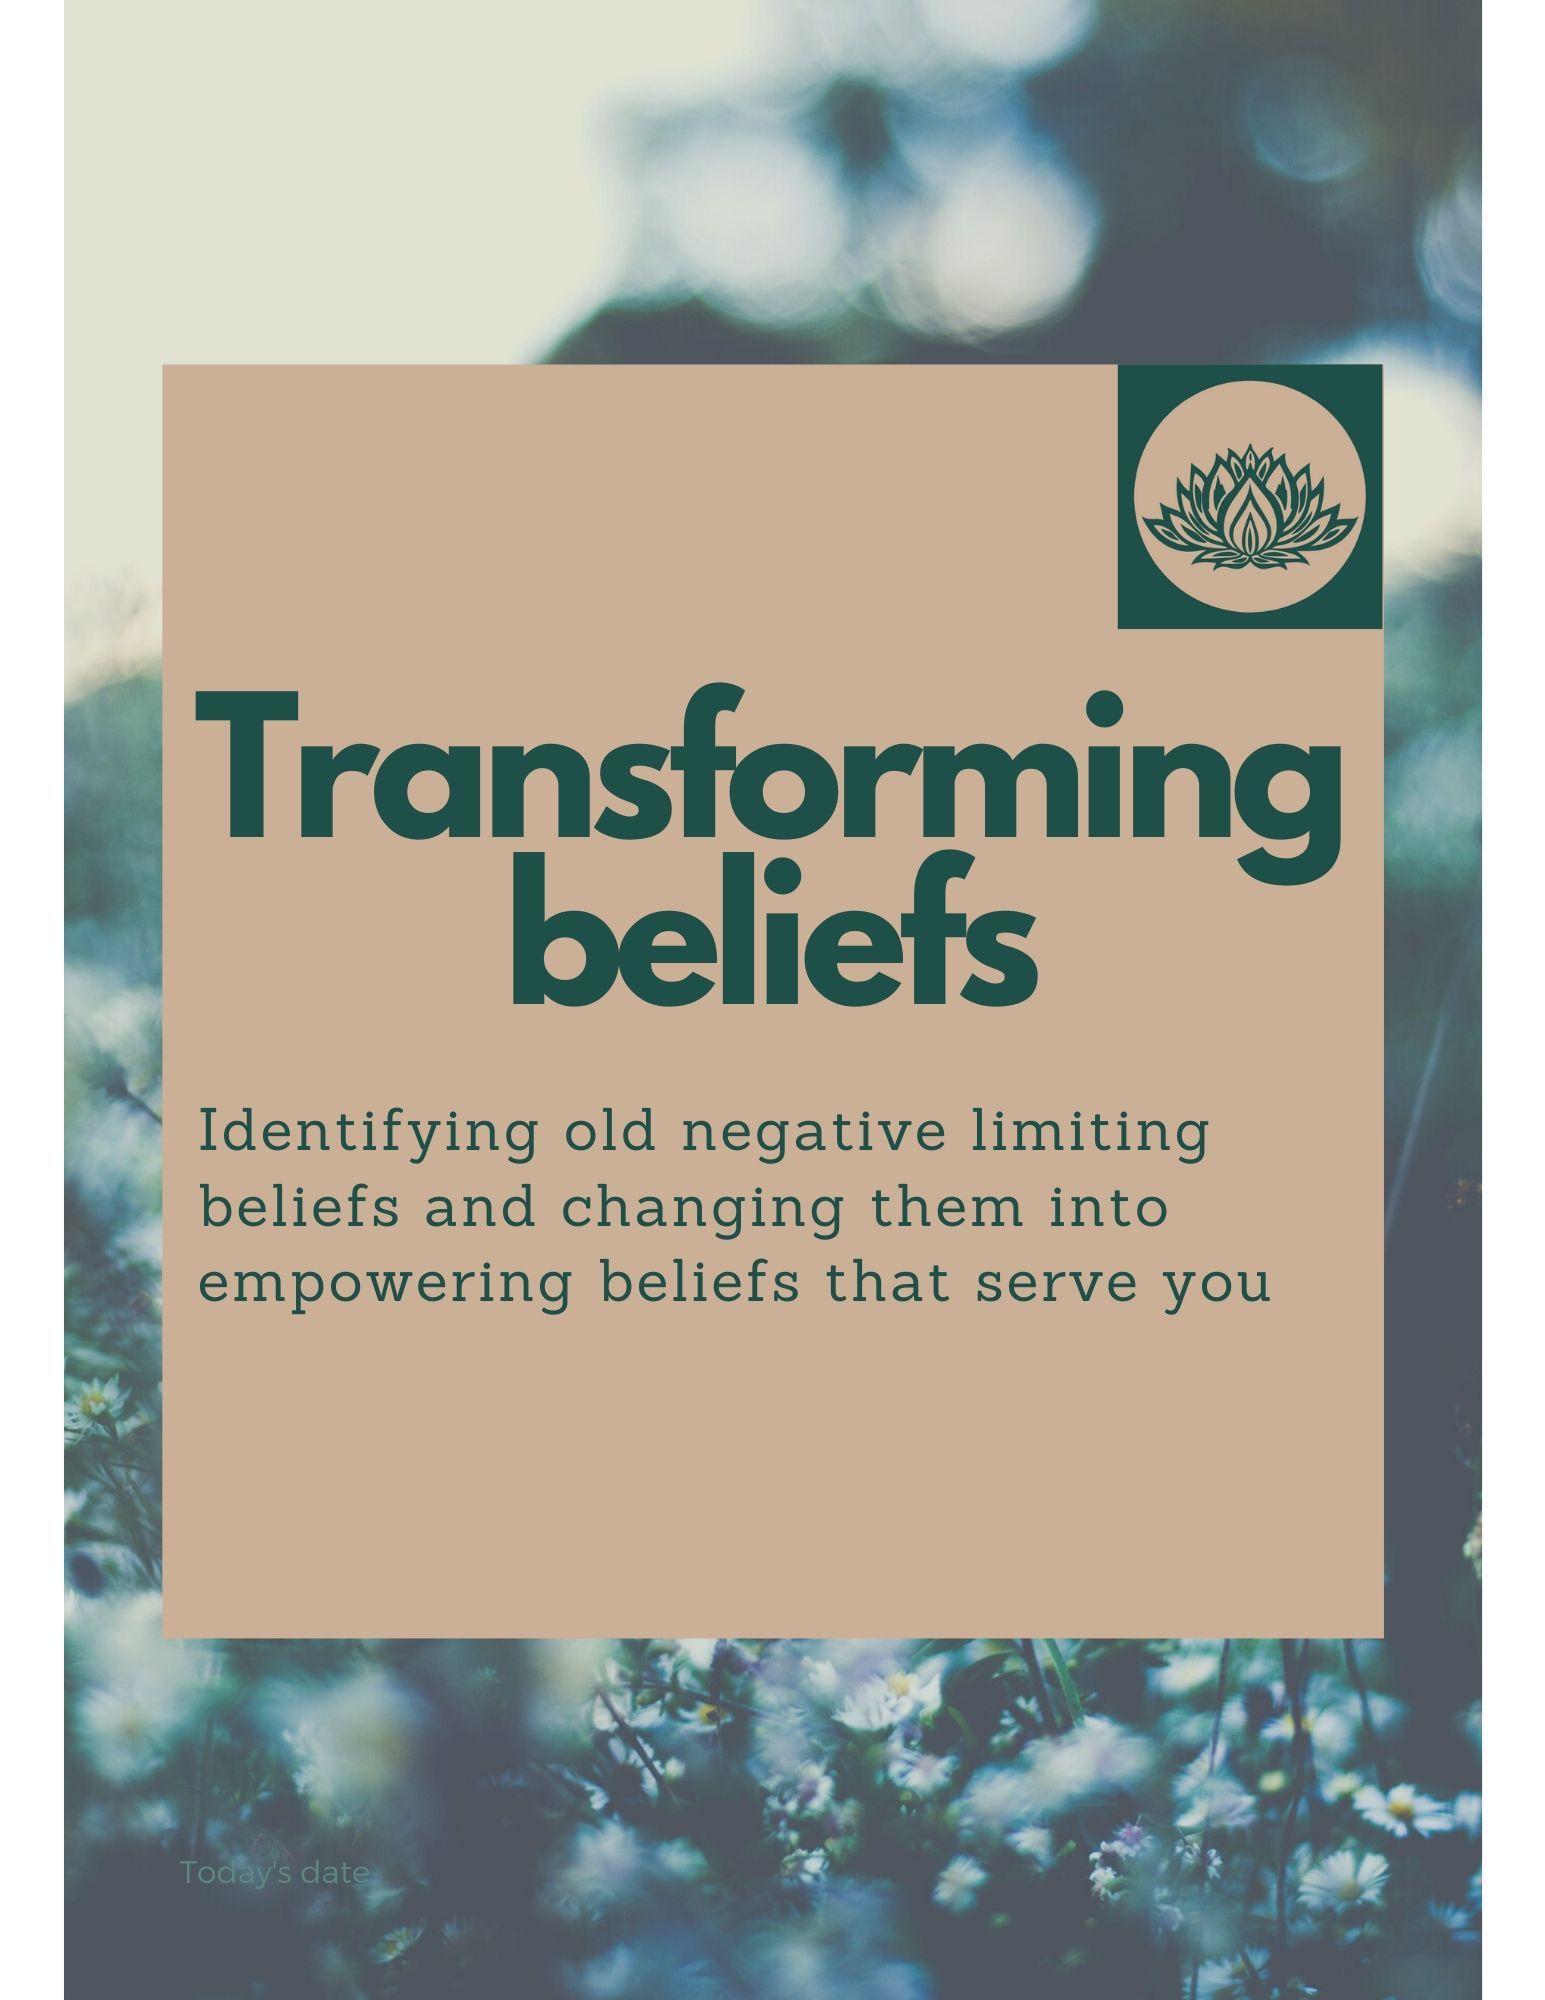 Transforming Your Limiting Beliefs Worksheet In